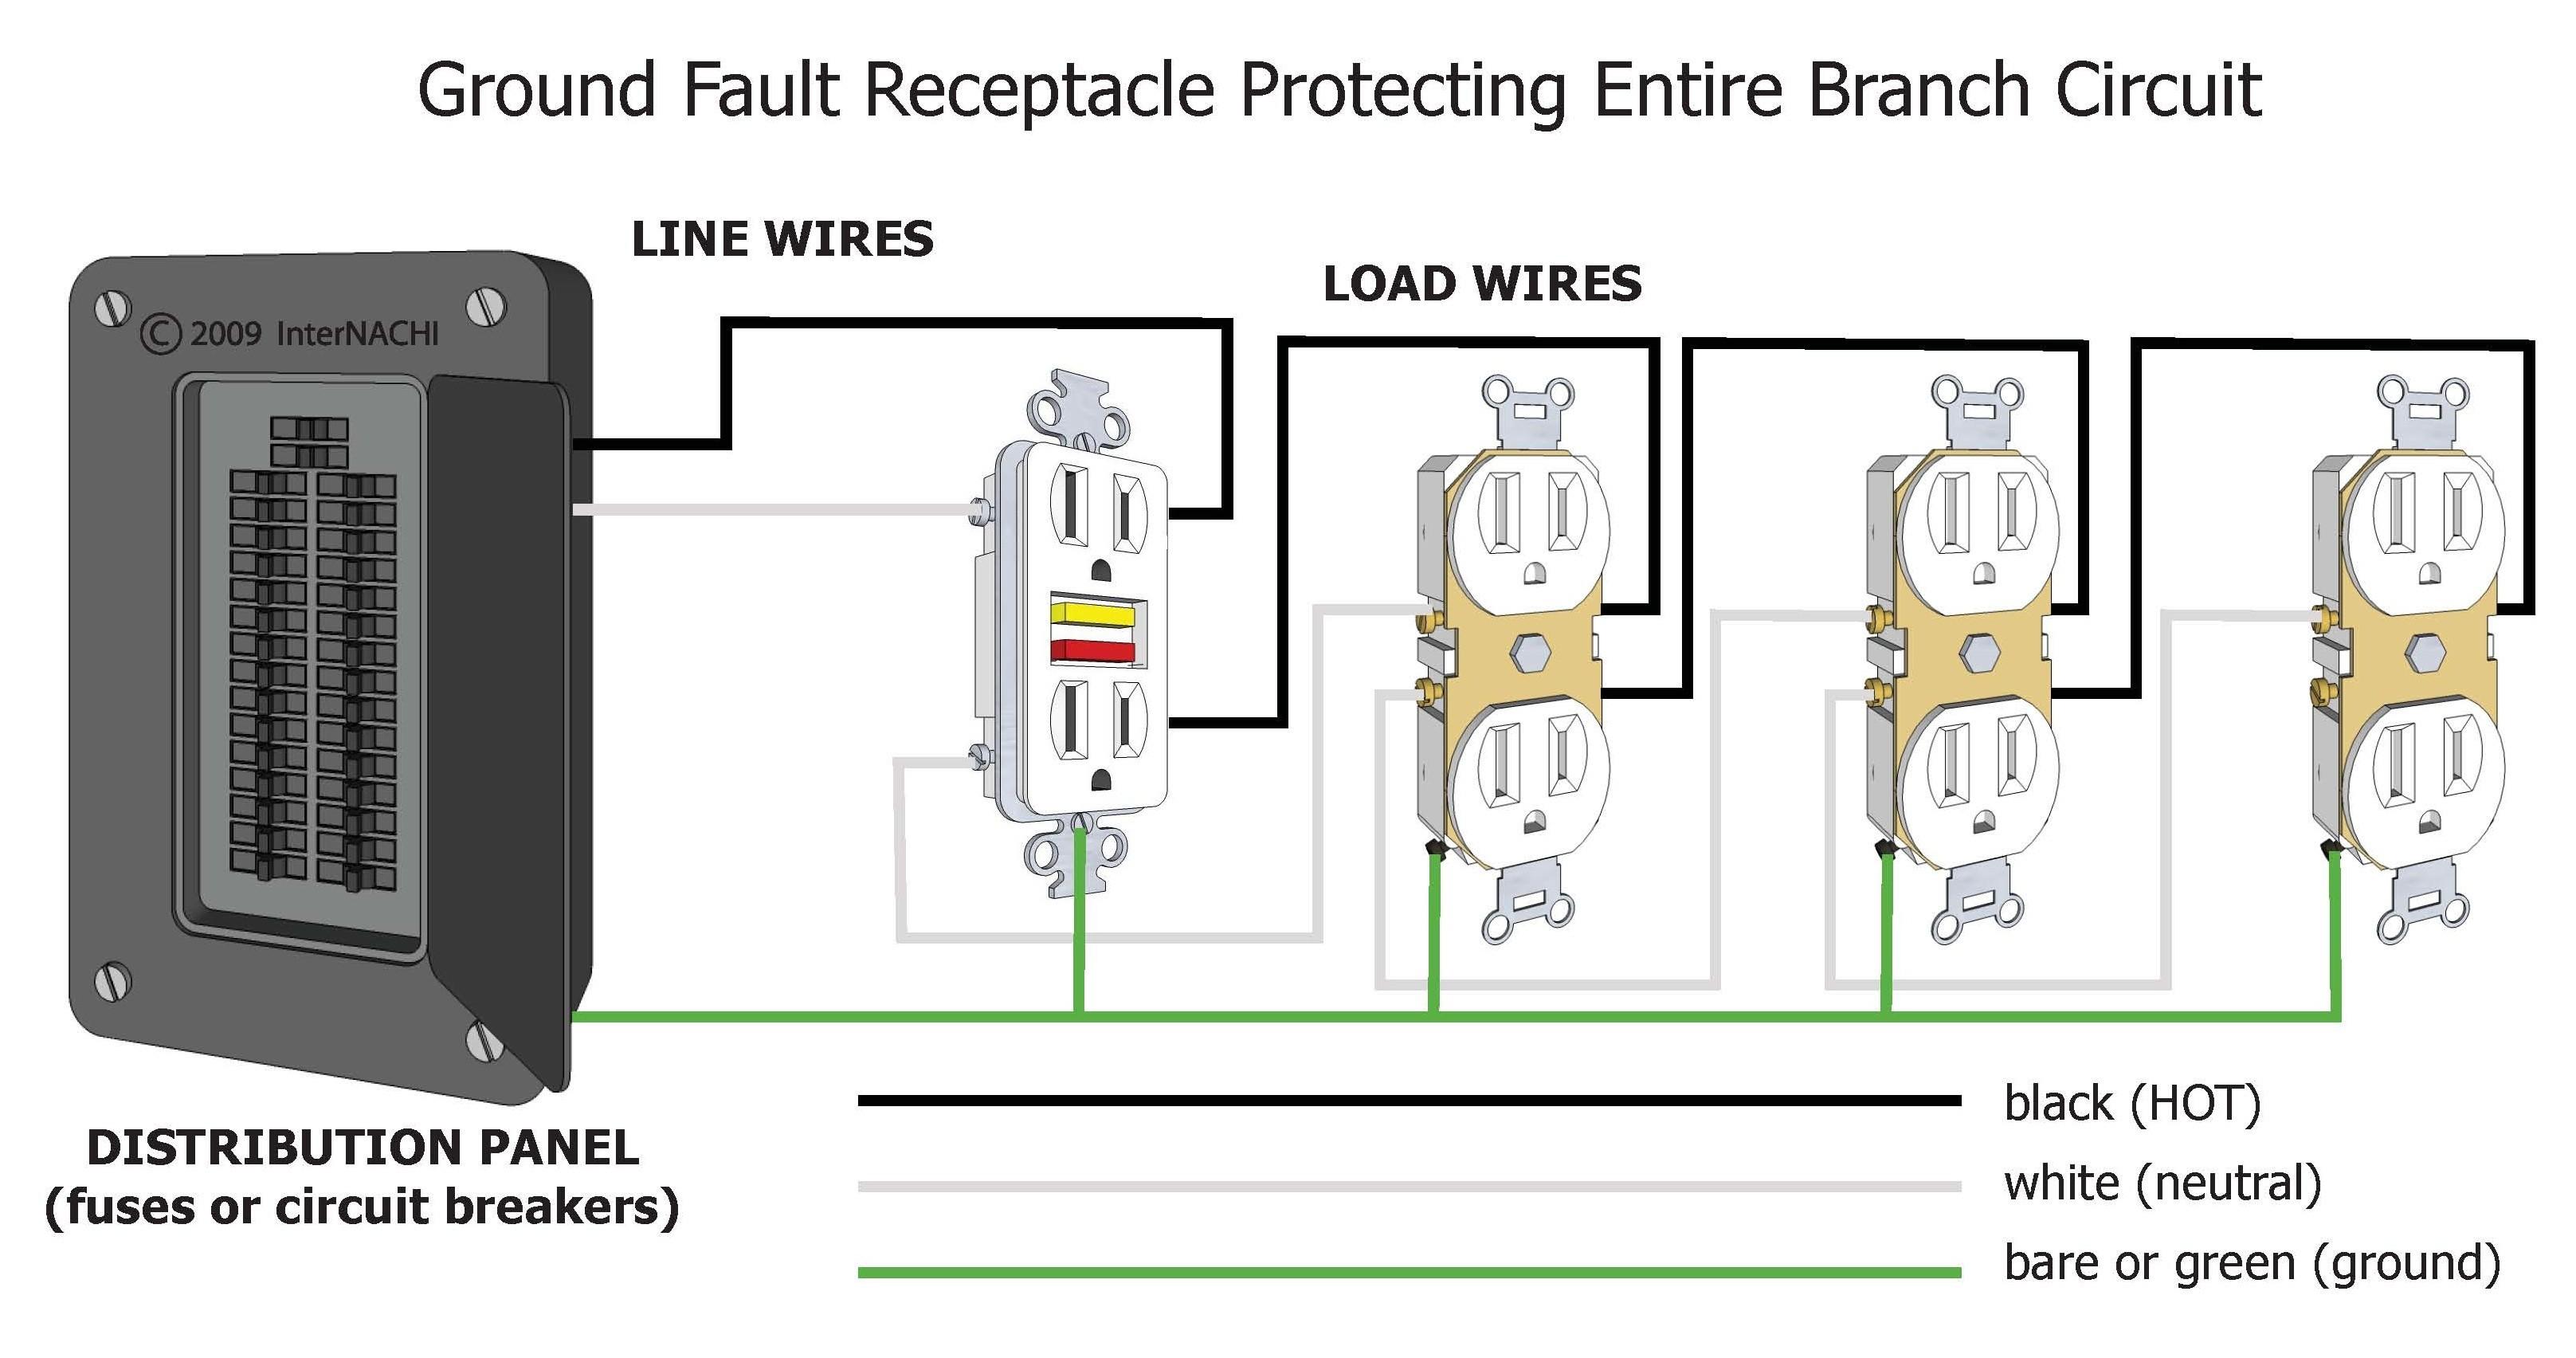 gfci wiring diagram feed through method to gfci wiring GFCI Plug Wiring Diagram gfci wiring diagram feed through method gfci wiring diagram without ground valid gfci circuit breaker wiring of gfci wiring diagram feed through method